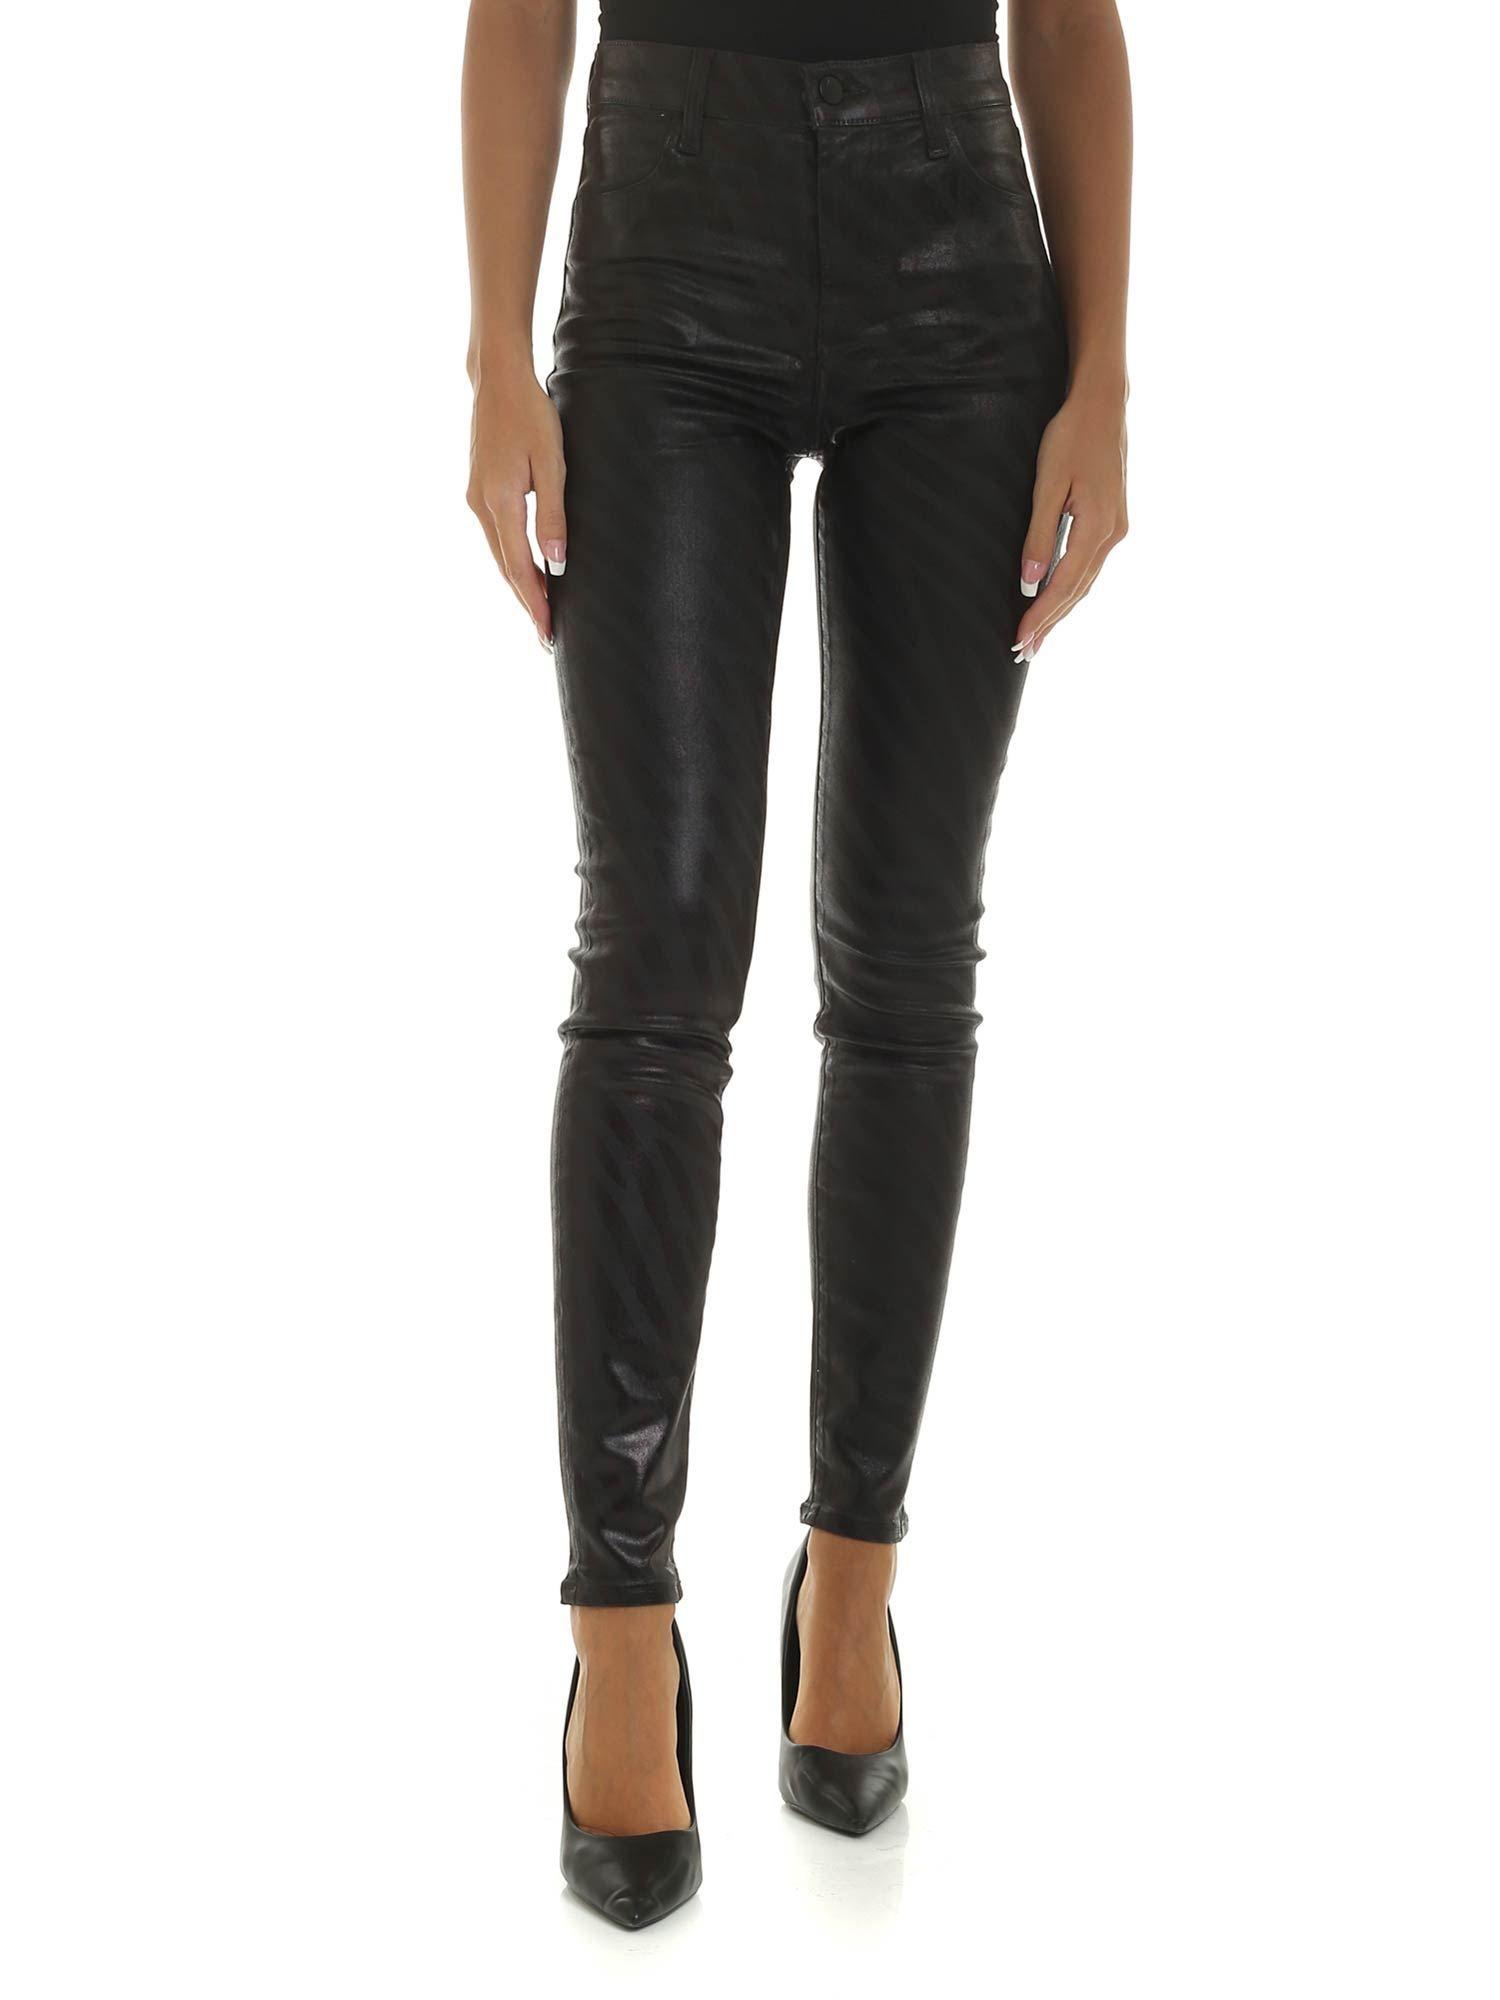 J Brand Black Cotton Jeans